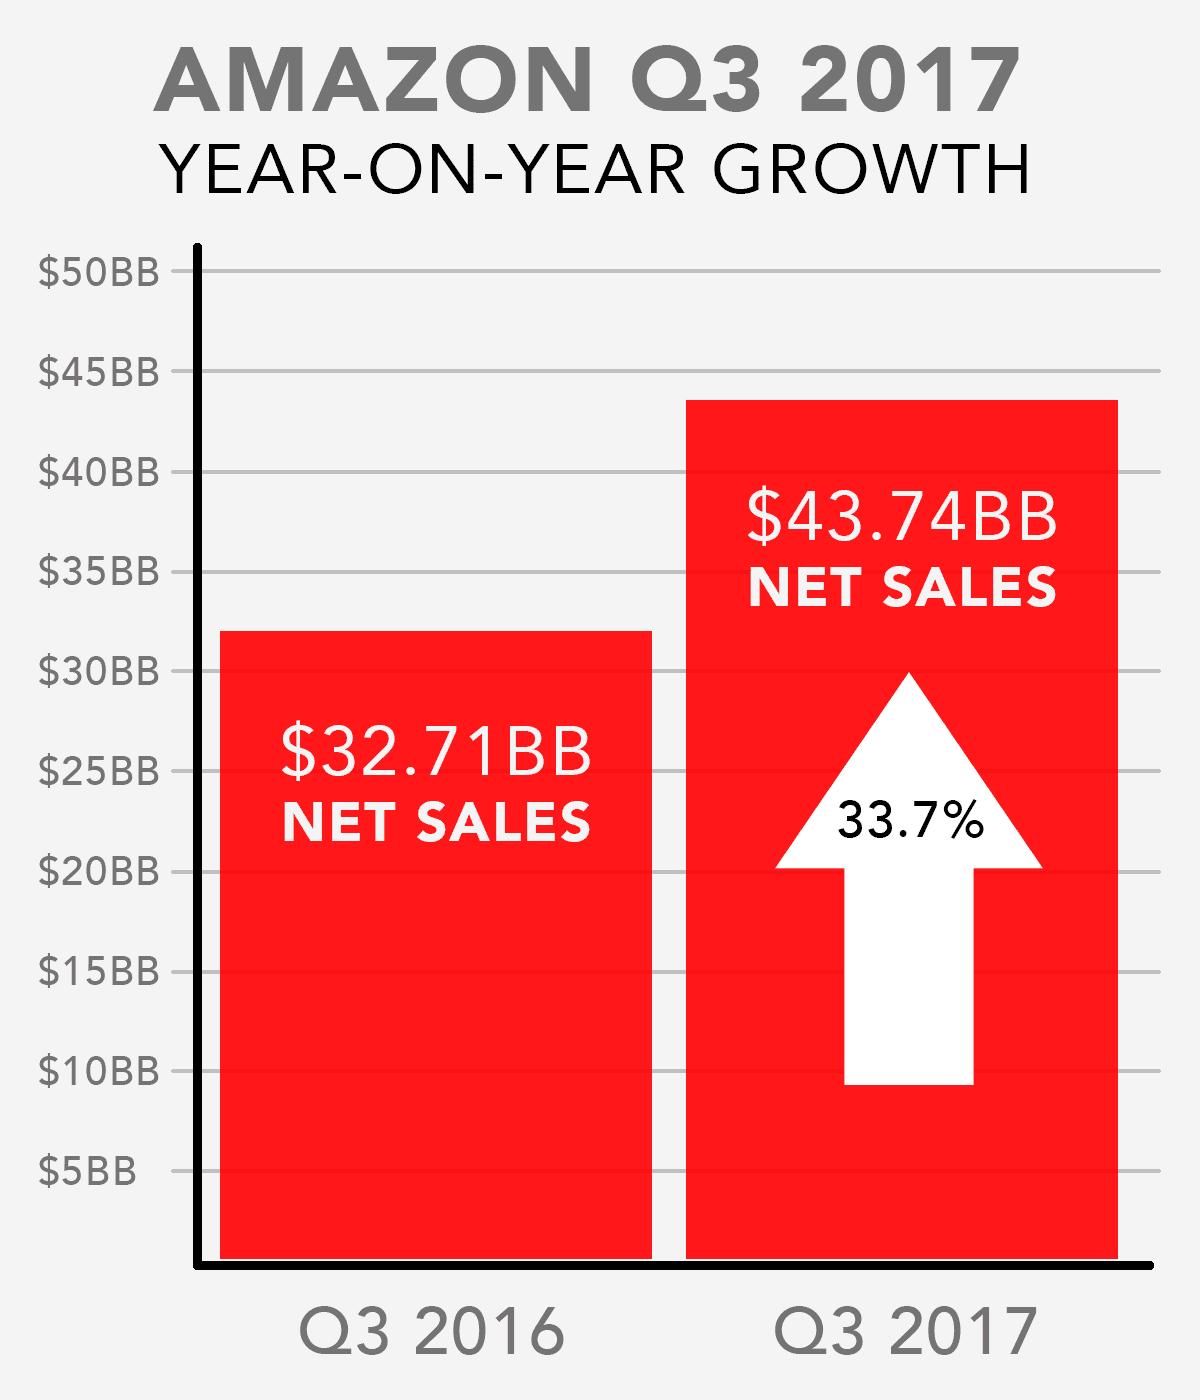 Amazon Growth Chart 2017 Q3 Year-on-year